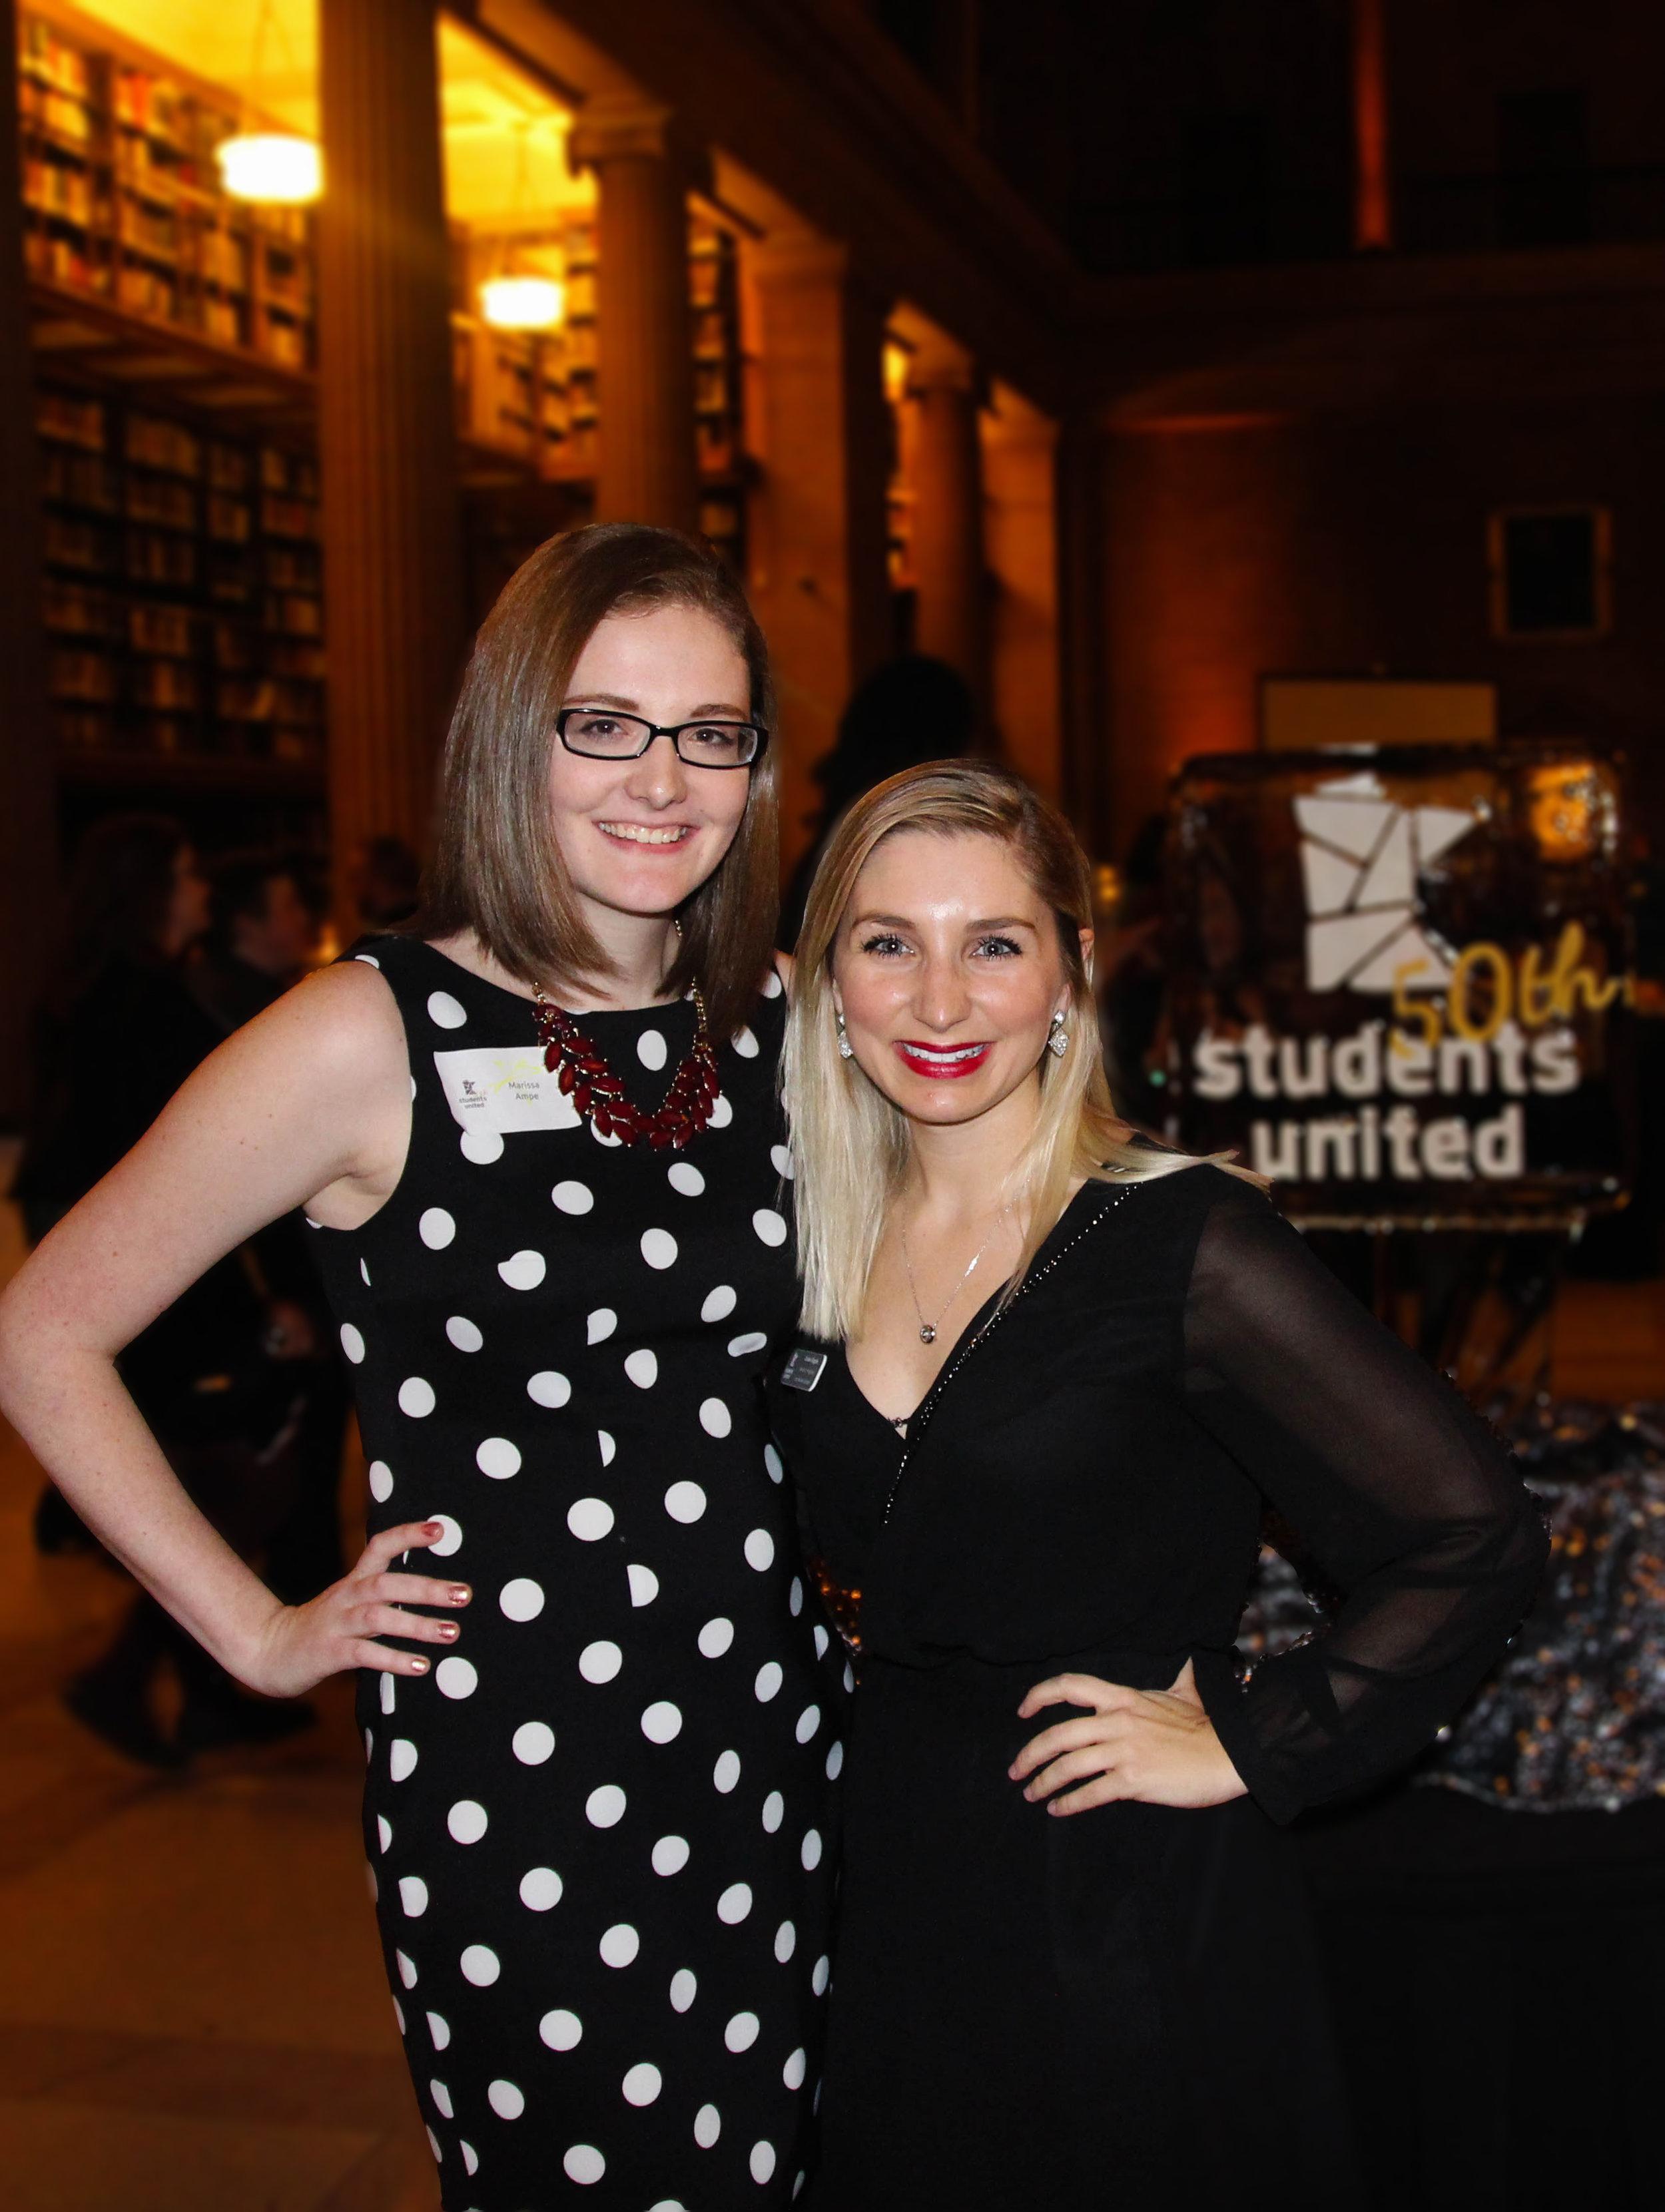 Carlee [right] & her former intern Marissa [left] at 50th Gala.